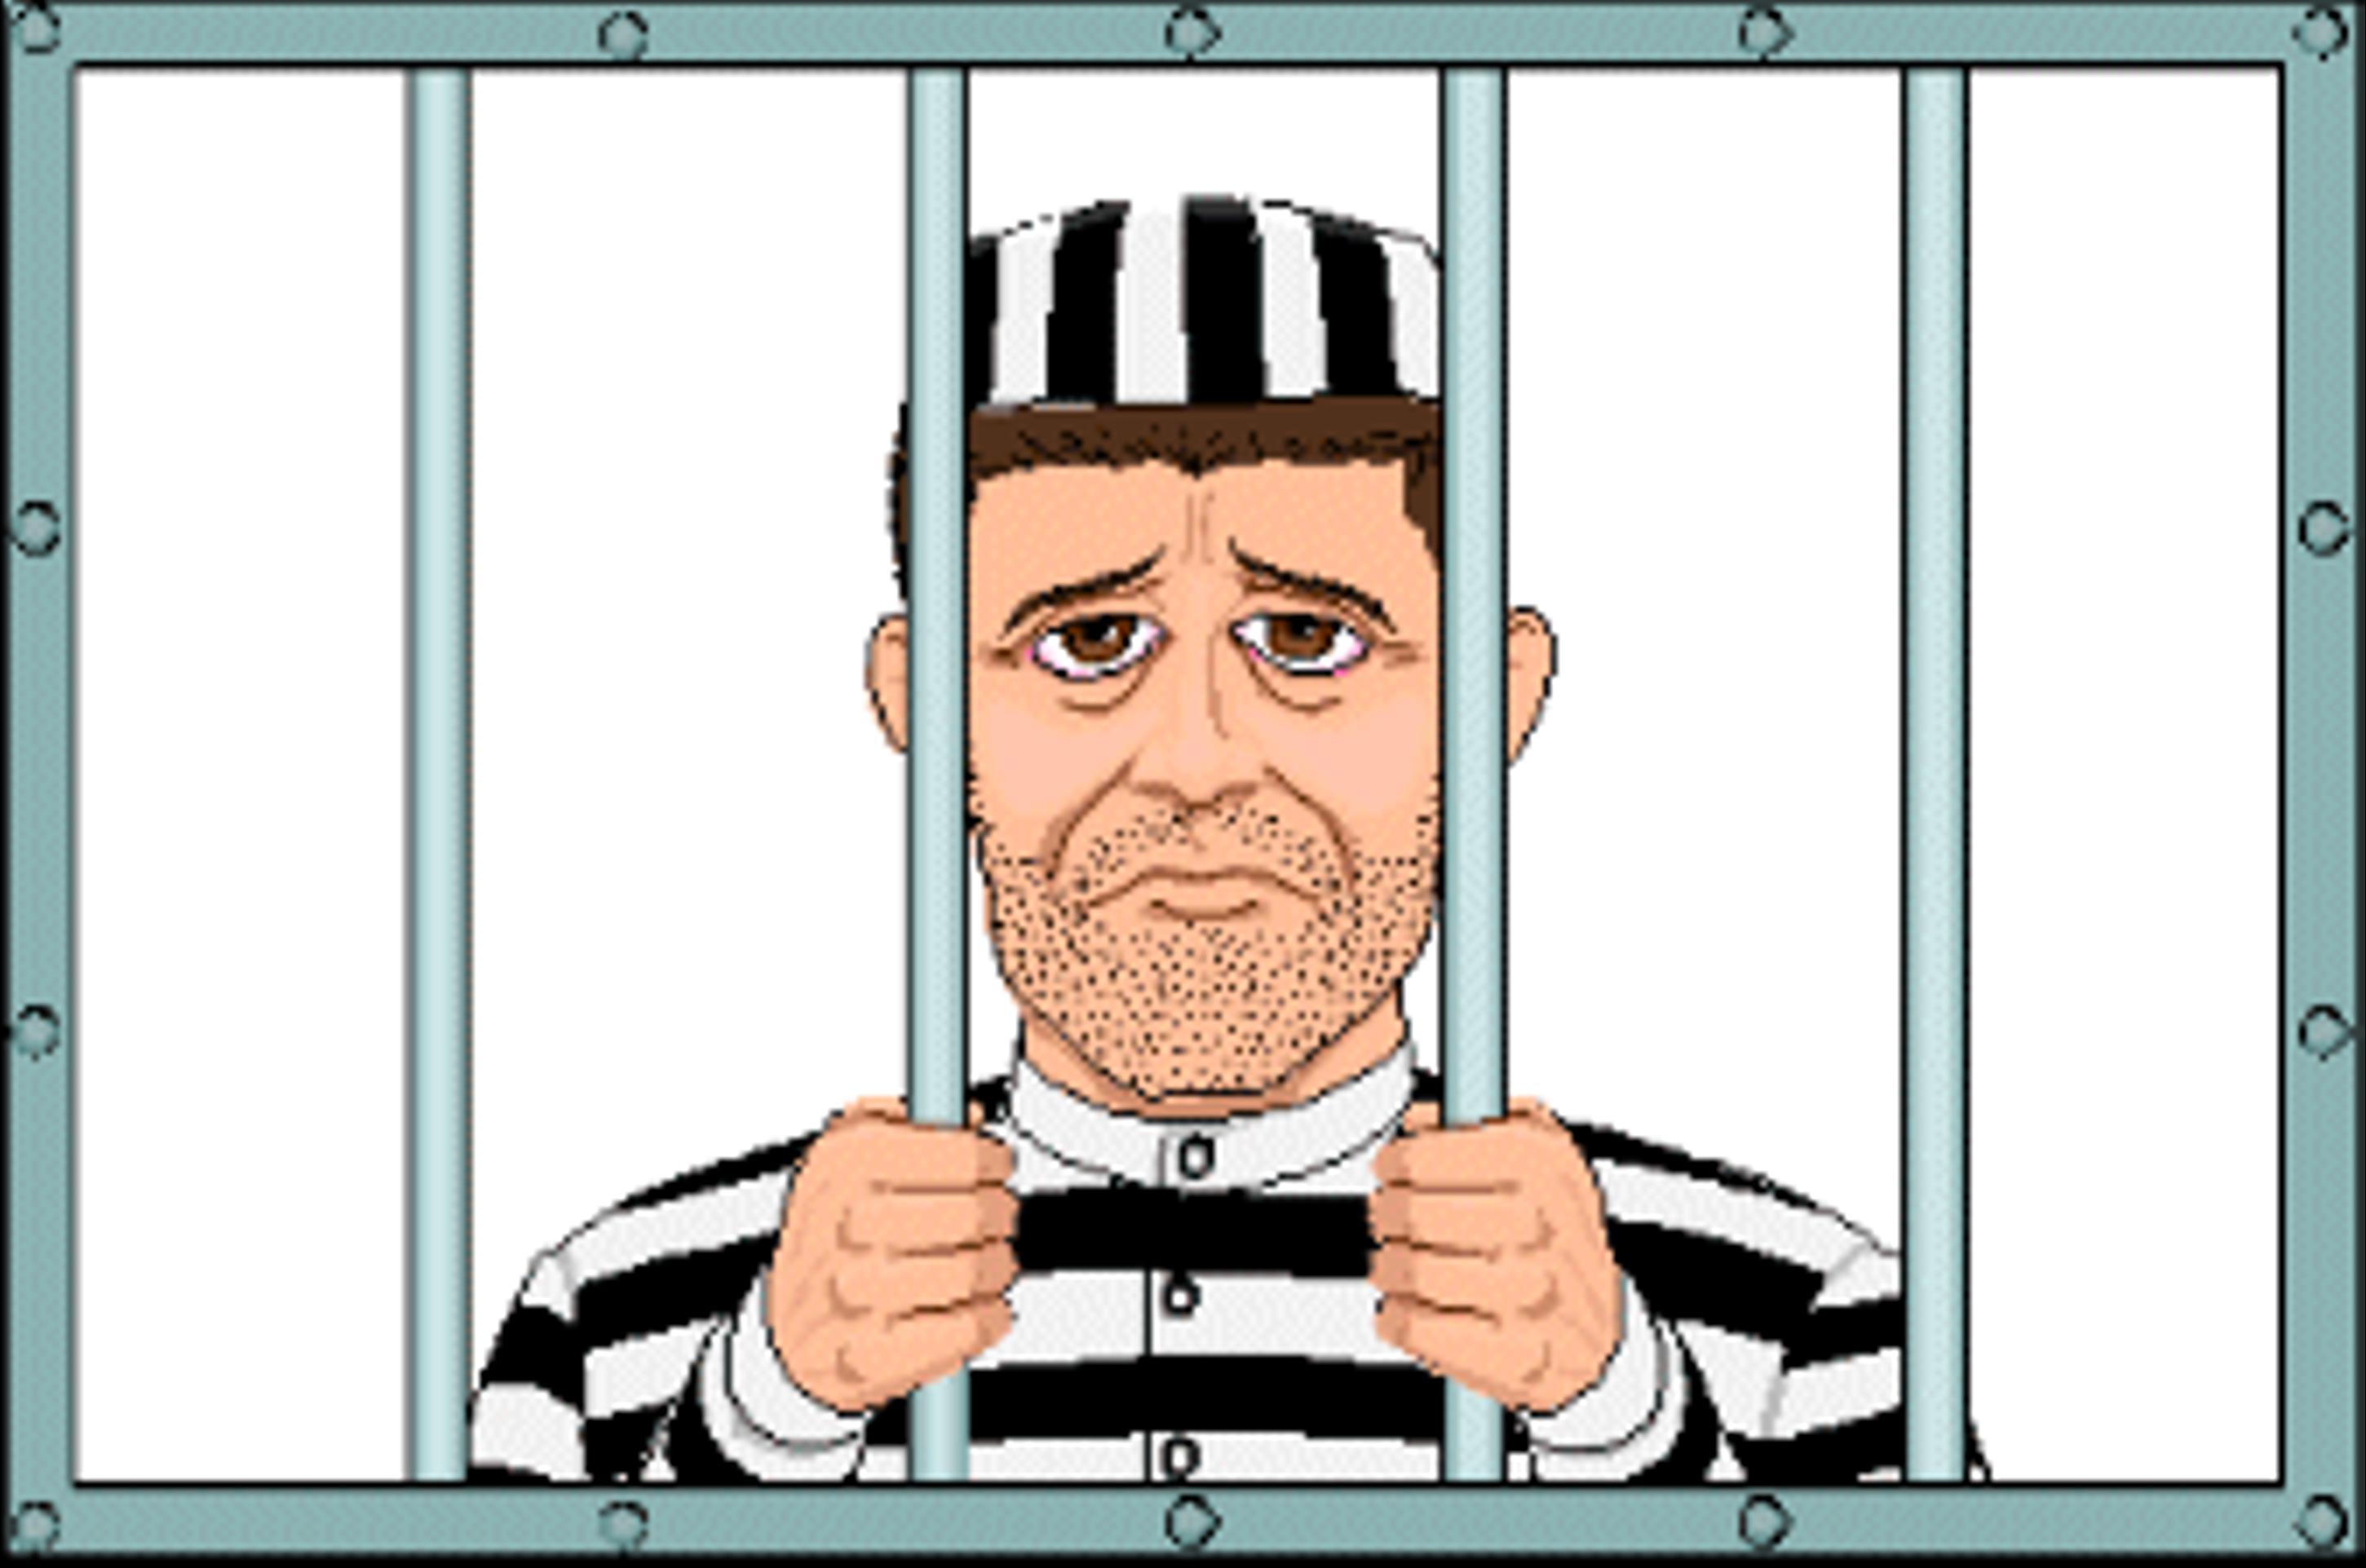 Convict.